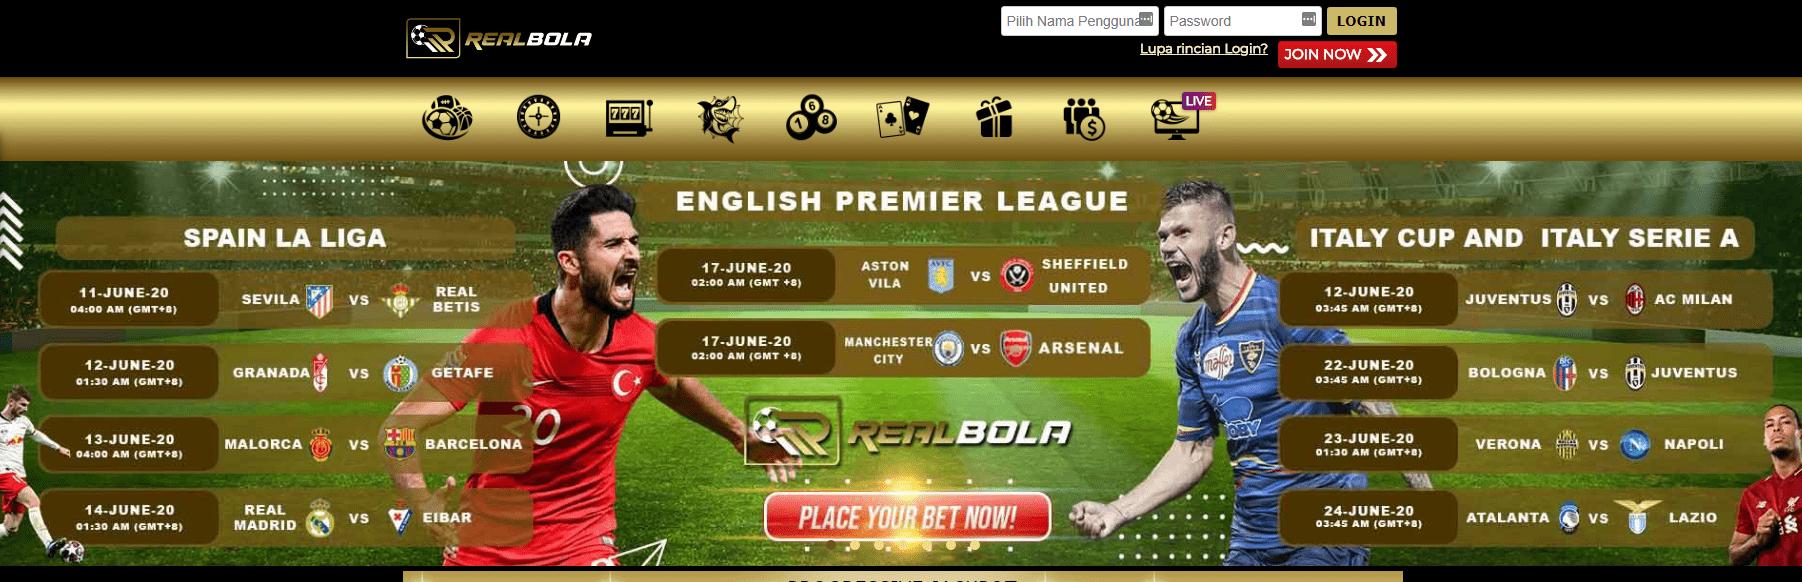 Situs permainan online Realbola